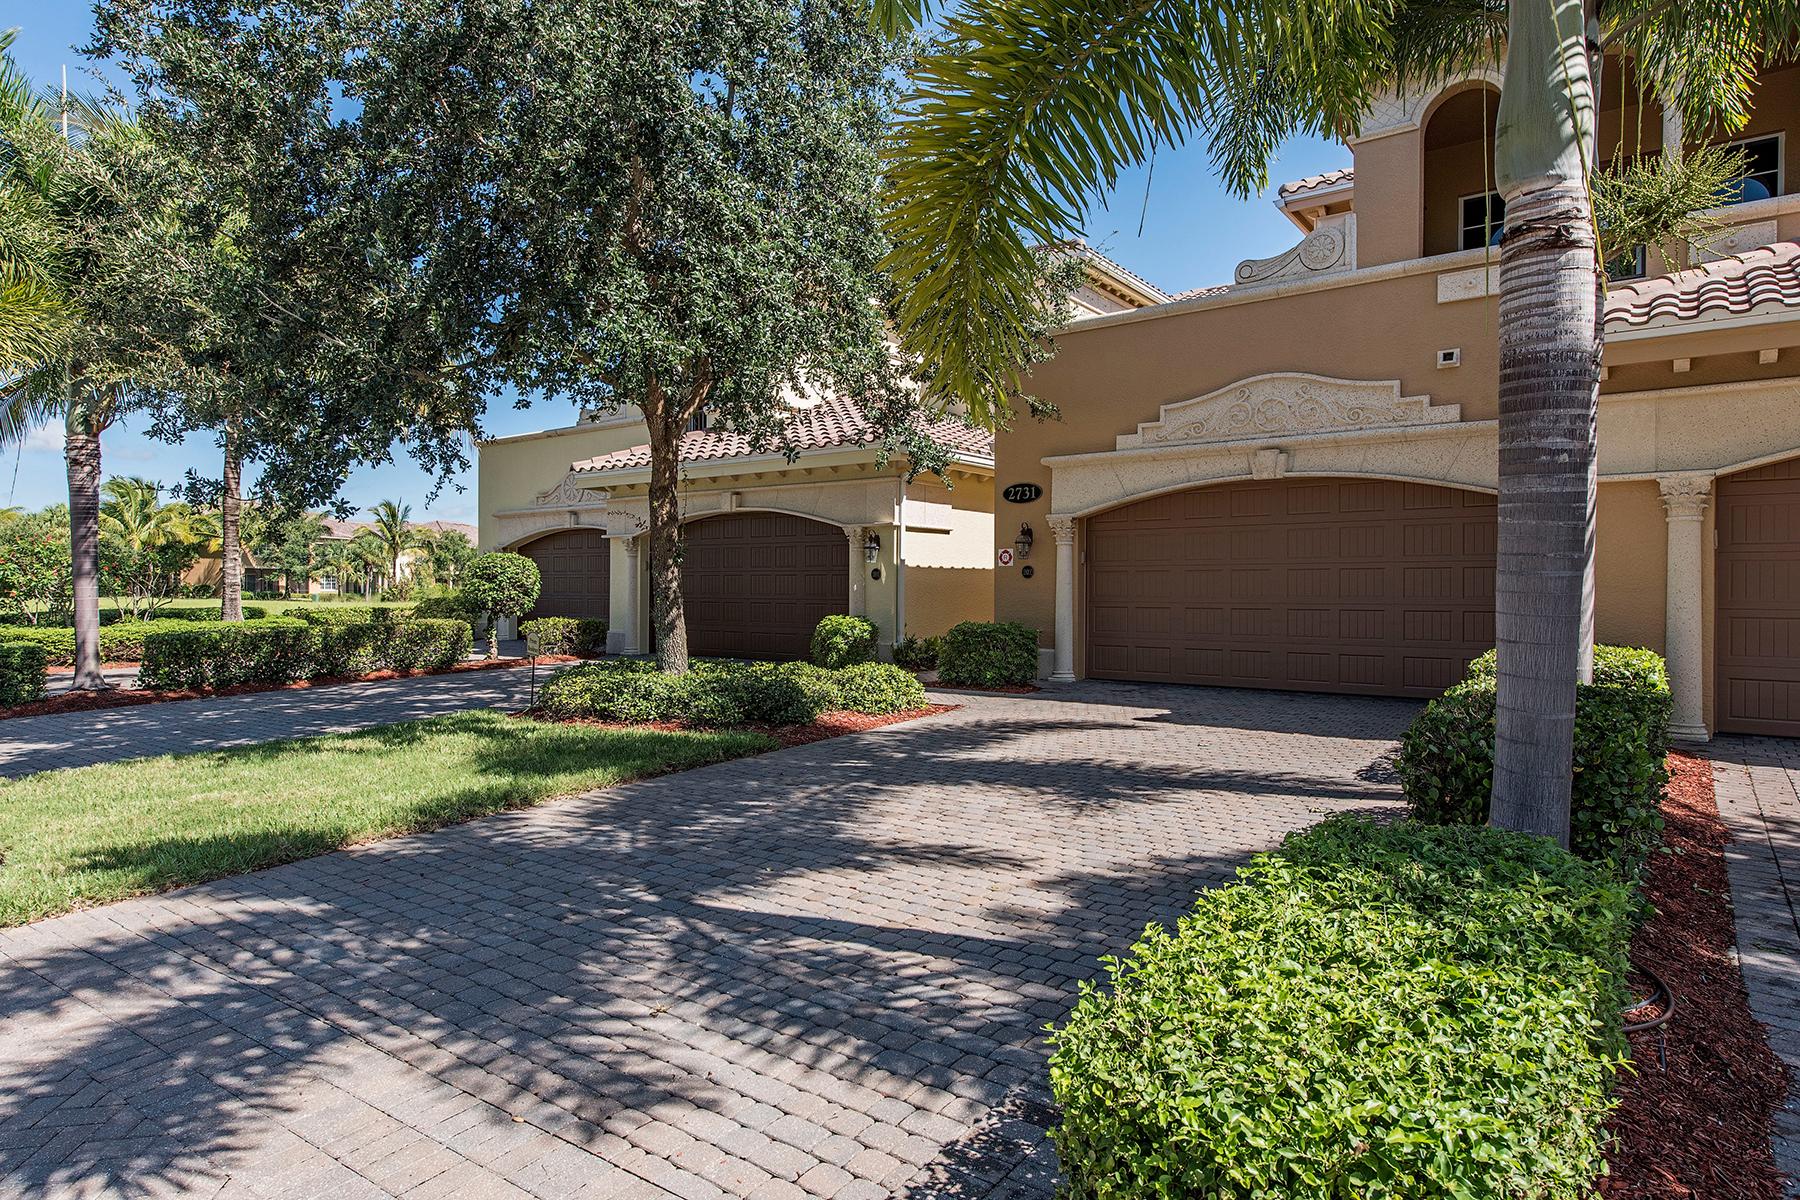 Nhà chung cư vì Bán tại FIDDLER'S CREEK - CALLISTA 2731 Aviamar Cir 202 Naples, Florida 34114 Hoa Kỳ